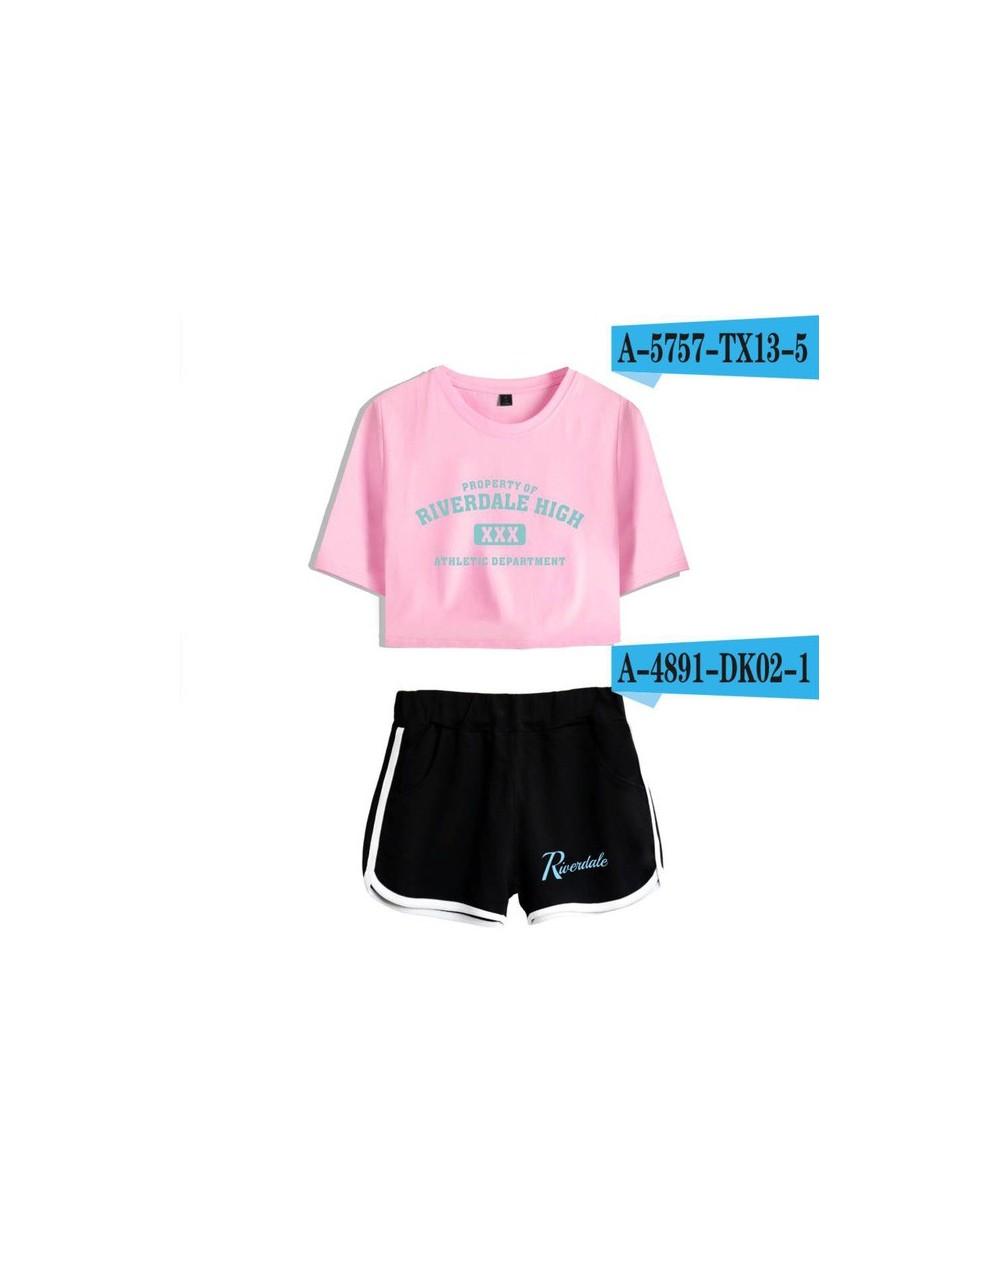 2018 riverdale t shirt Two-Piece Summer Print T-Shirt Women's Suit Fashion Top + Shorts south side serpents - Gray - 4C30860...